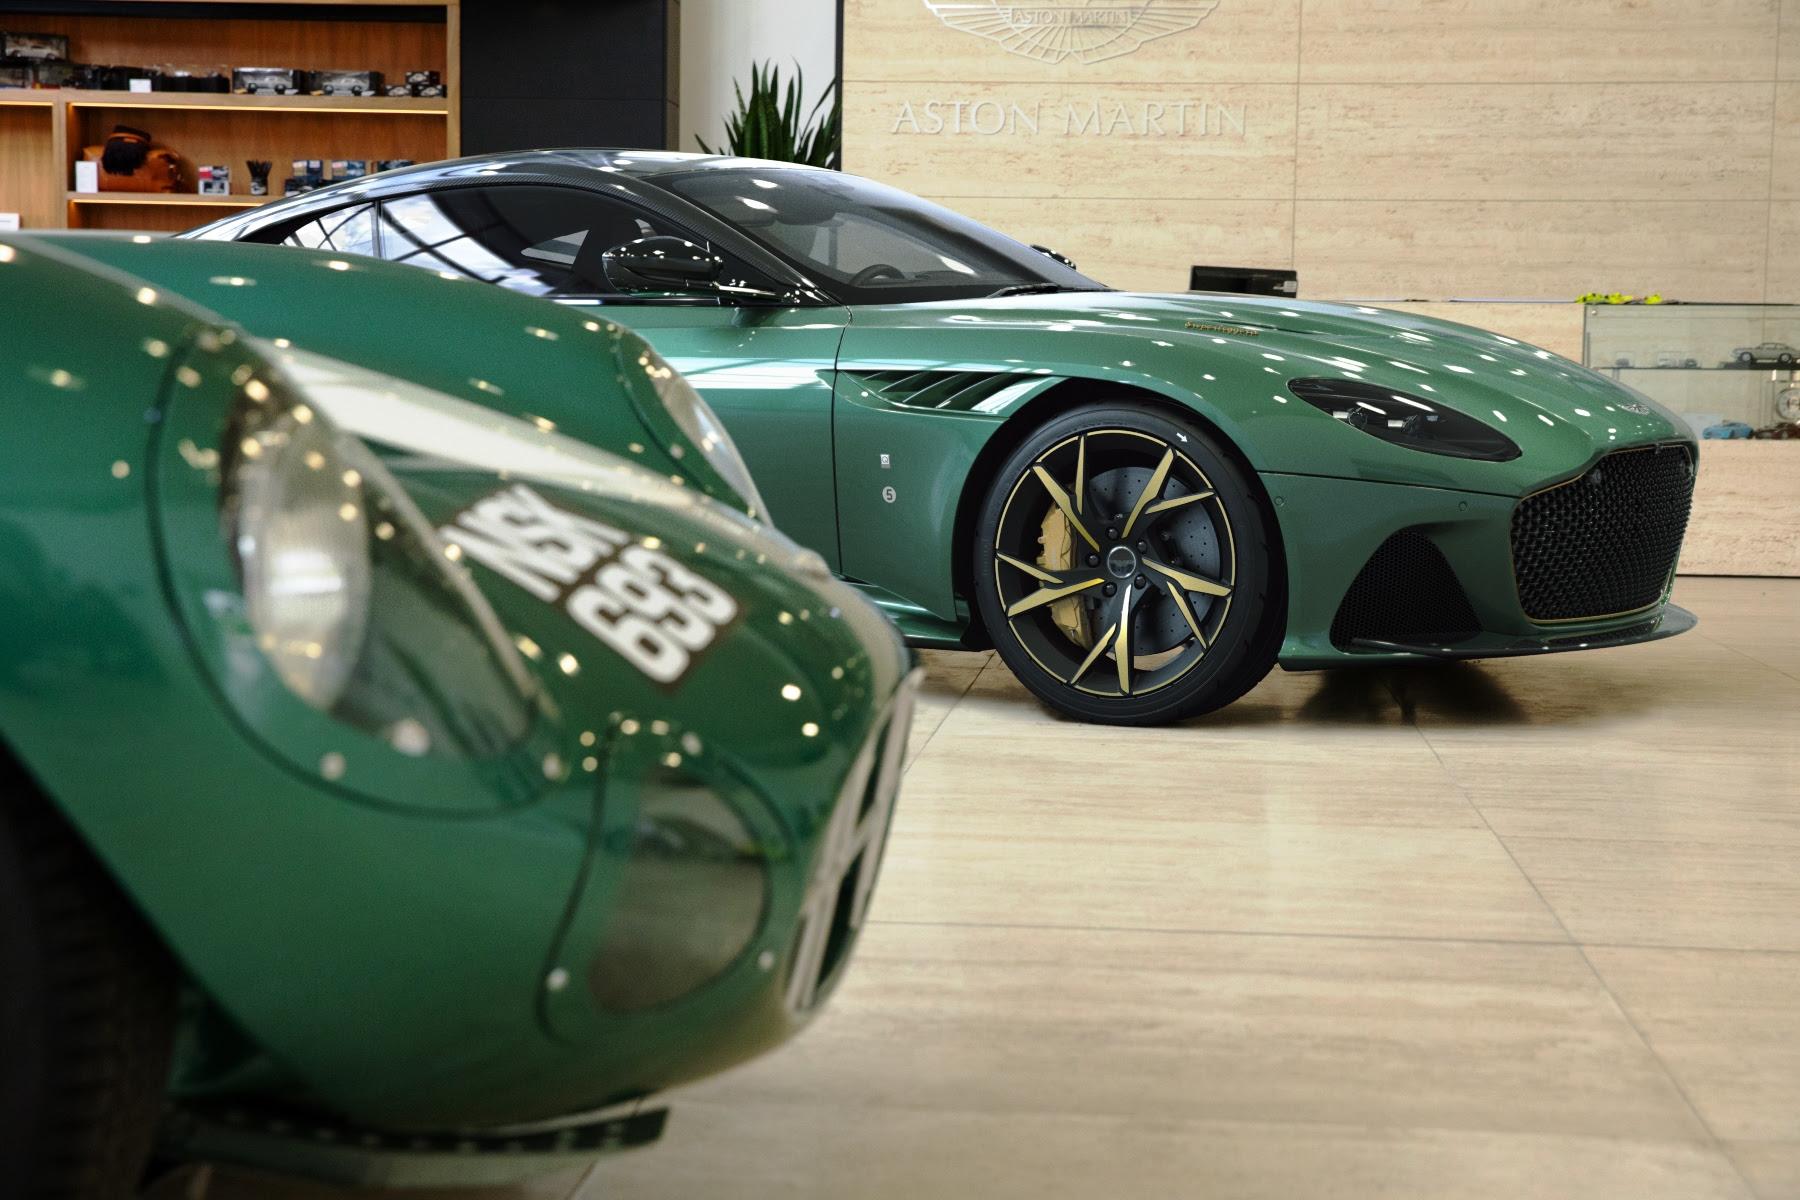 Aston Martin Dbs 59 Celebrates Historic Le Mans Win Automotive Blog